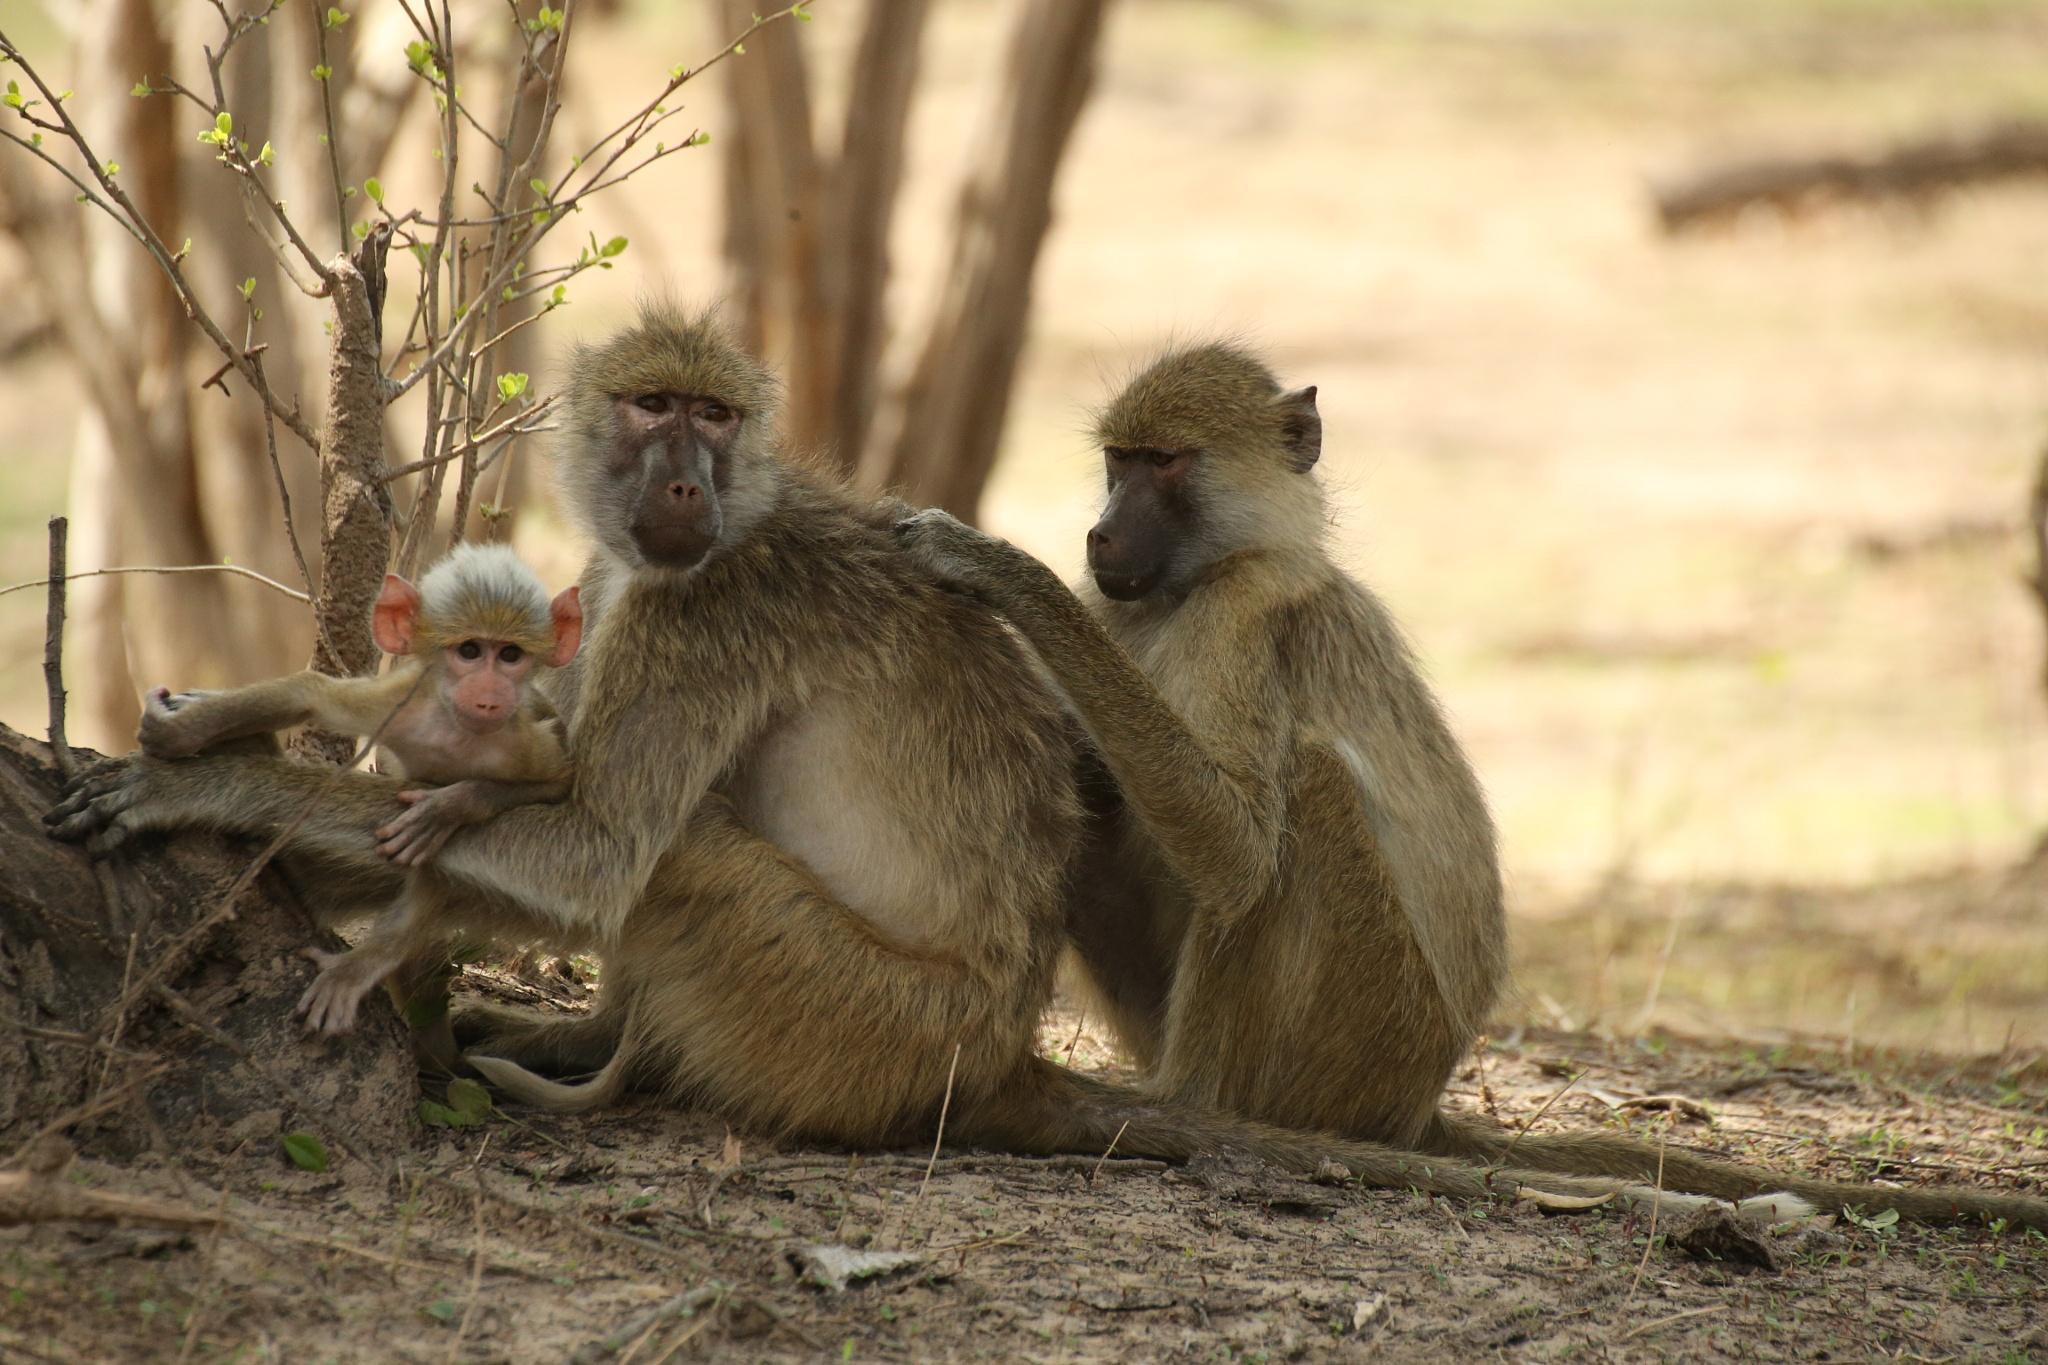 Baboons by Steve Brammall